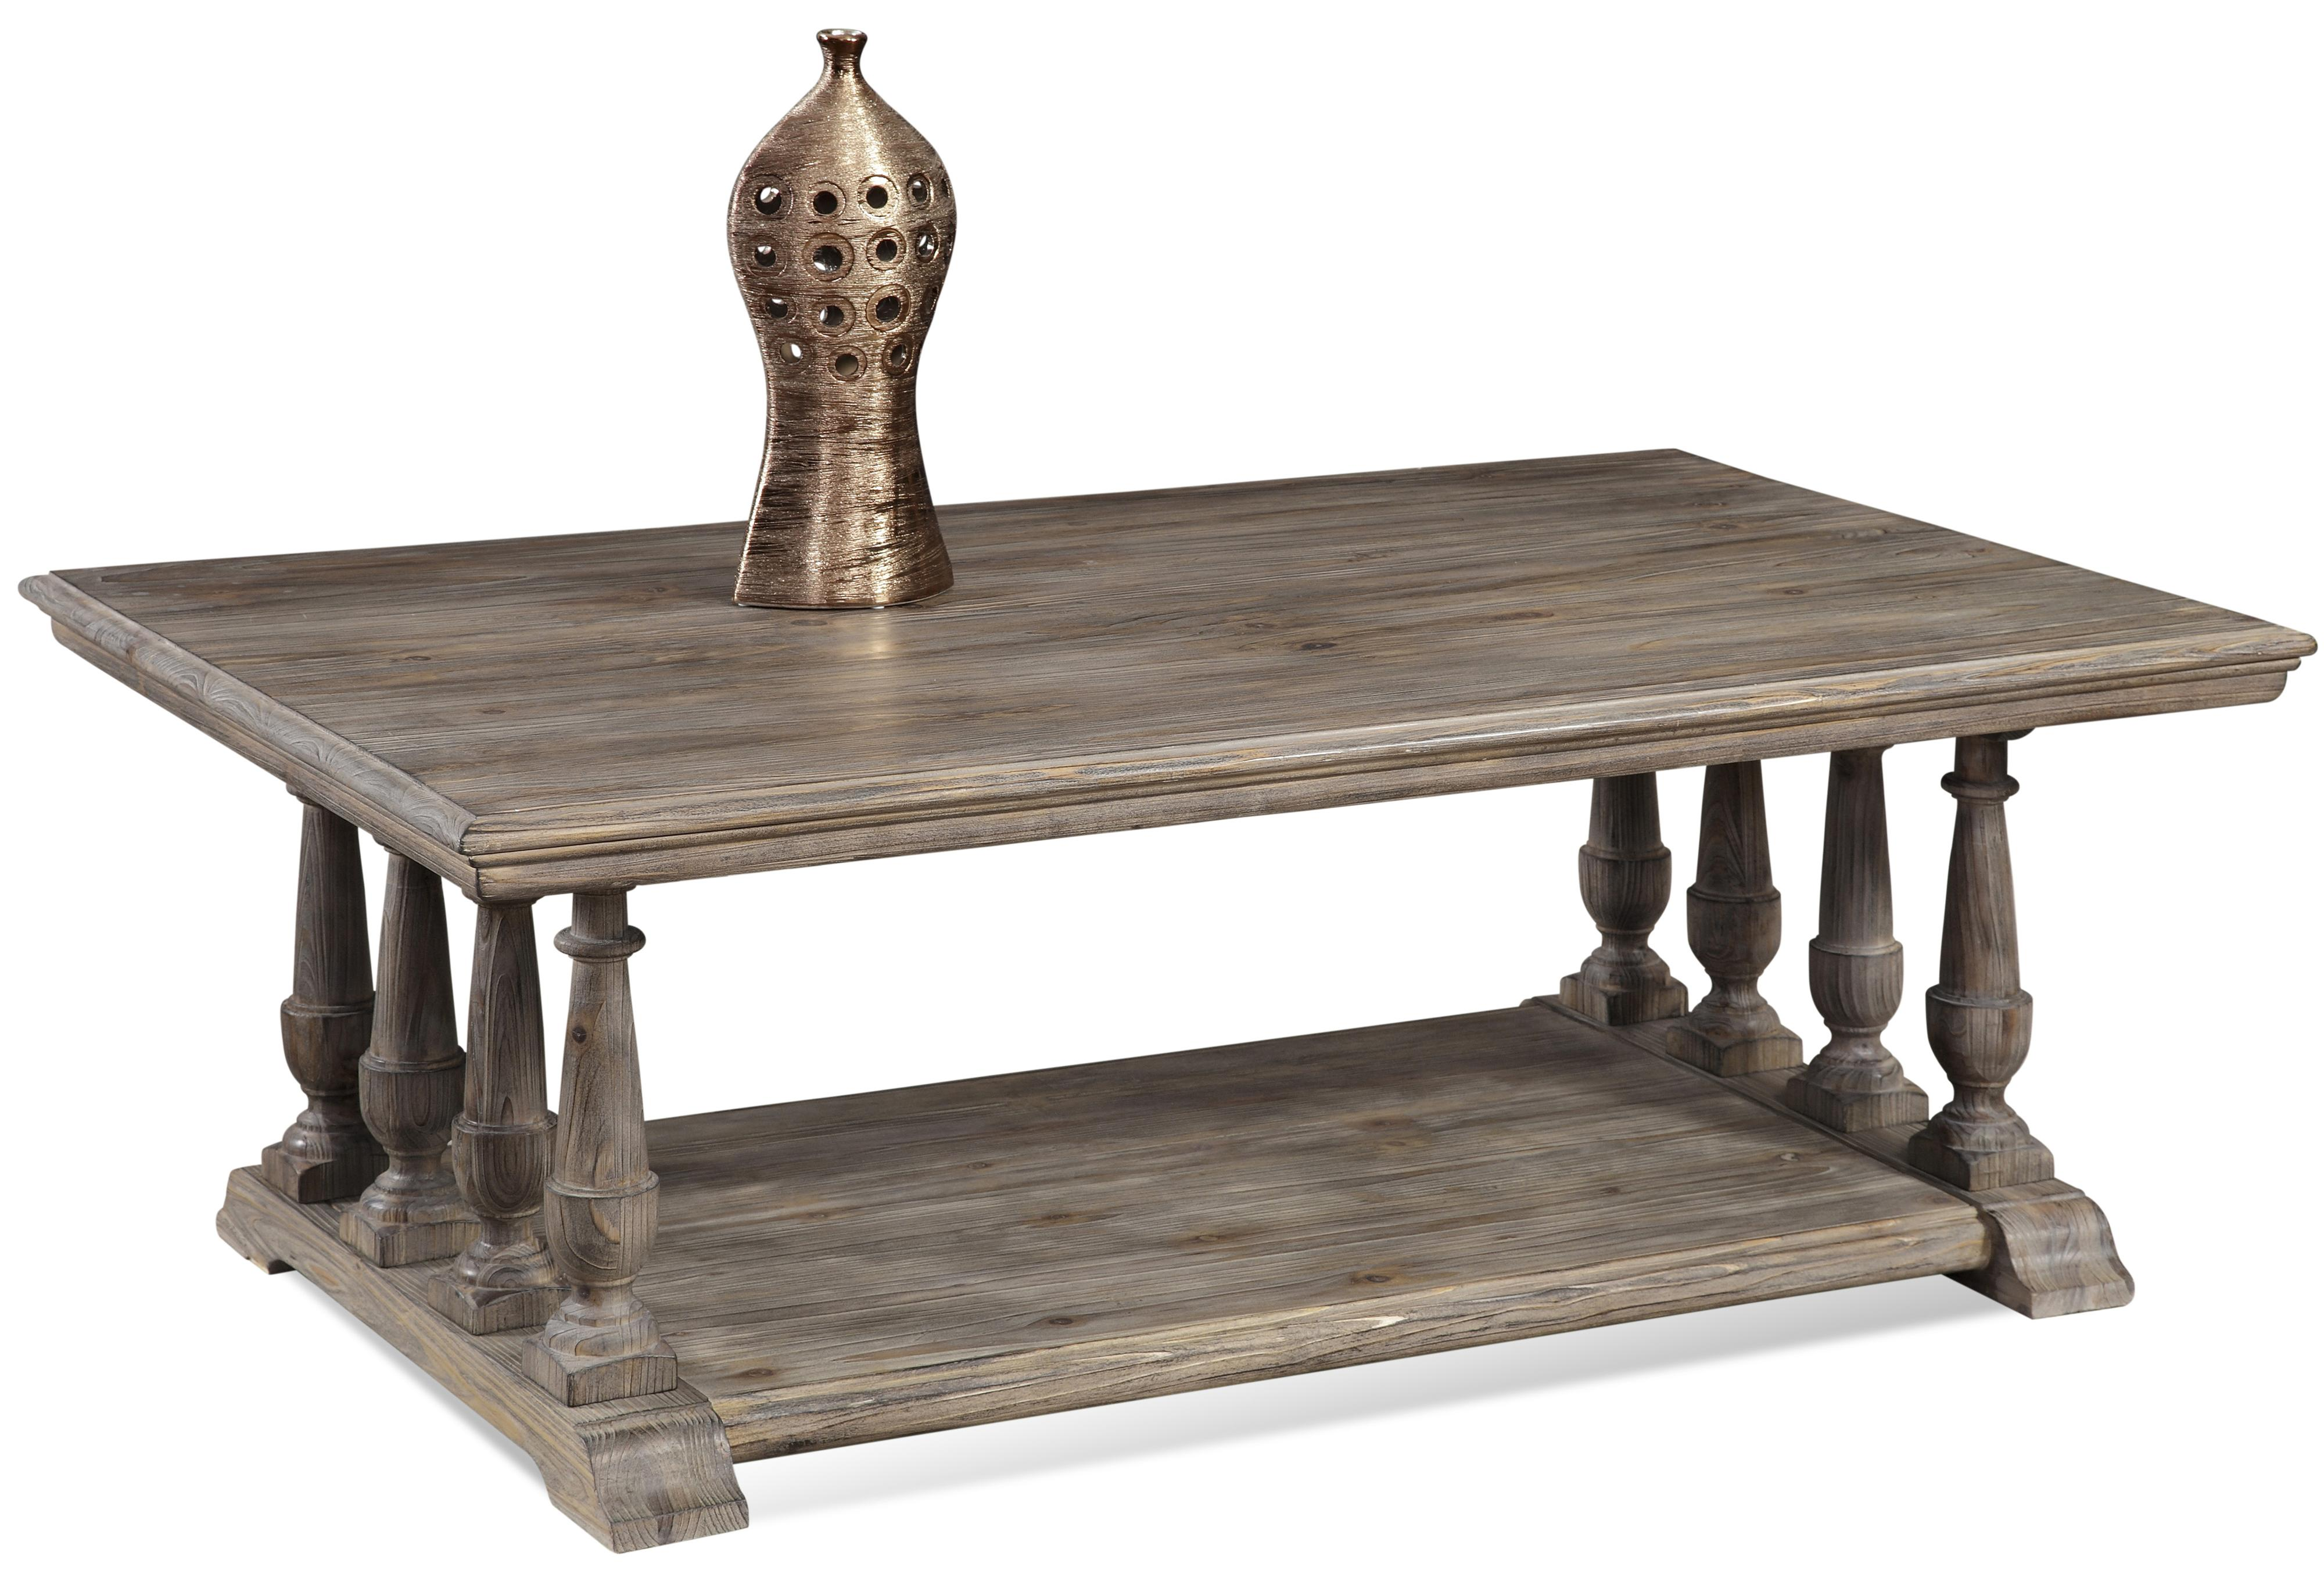 Pemberton Rectangular Cocktail Table by Bassett Mirror at Lapeer Furniture & Mattress Center